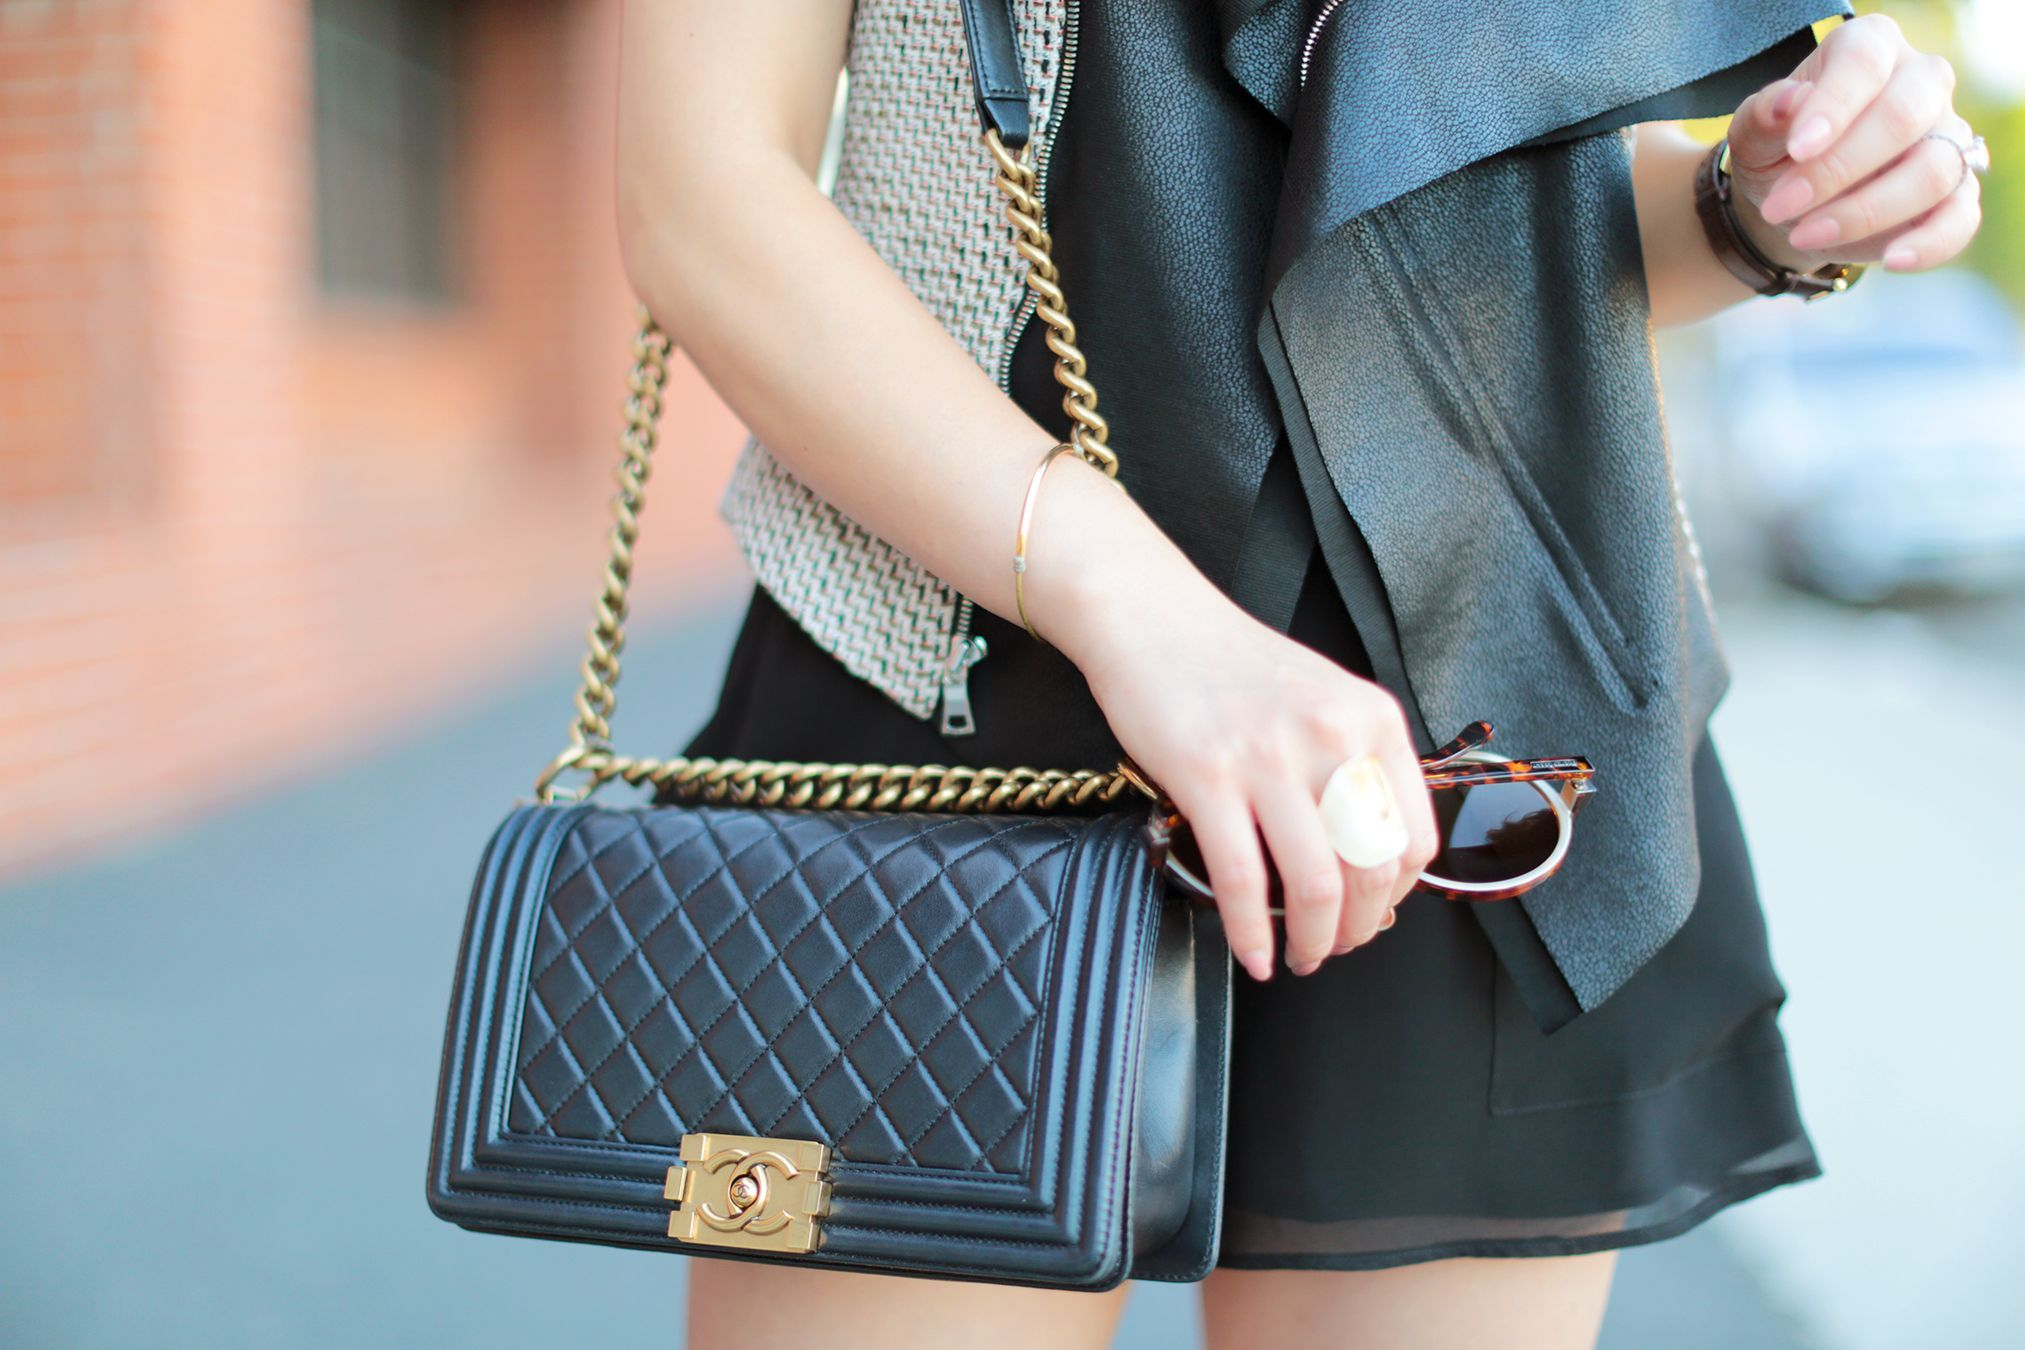 7d062bf824 Chanel Boy Bag Reference Guide - PurseBop